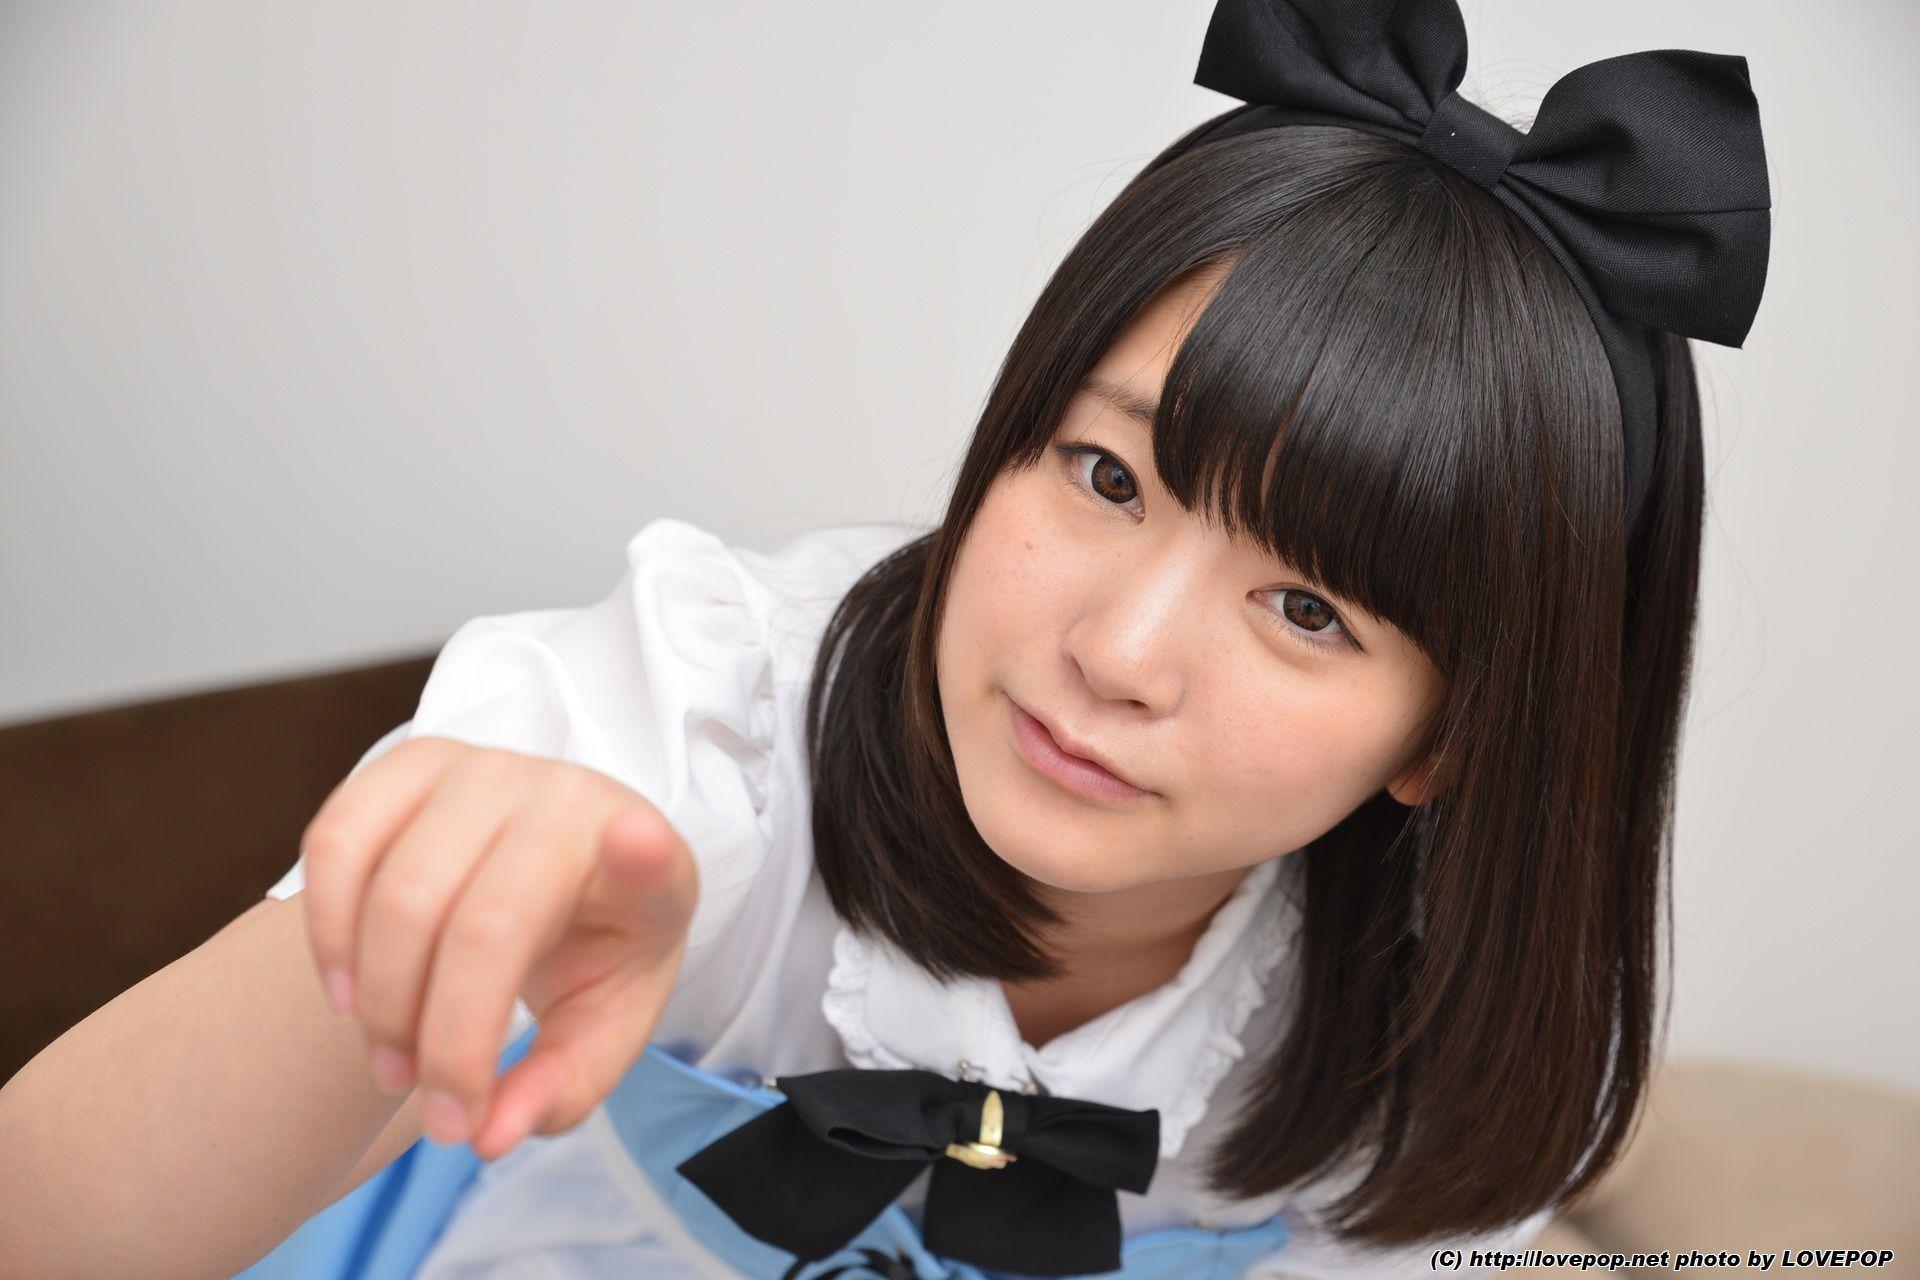 [LovePop] Tsuna Kimura 木村つな Maid Set03 写真集[65P]插图(9)